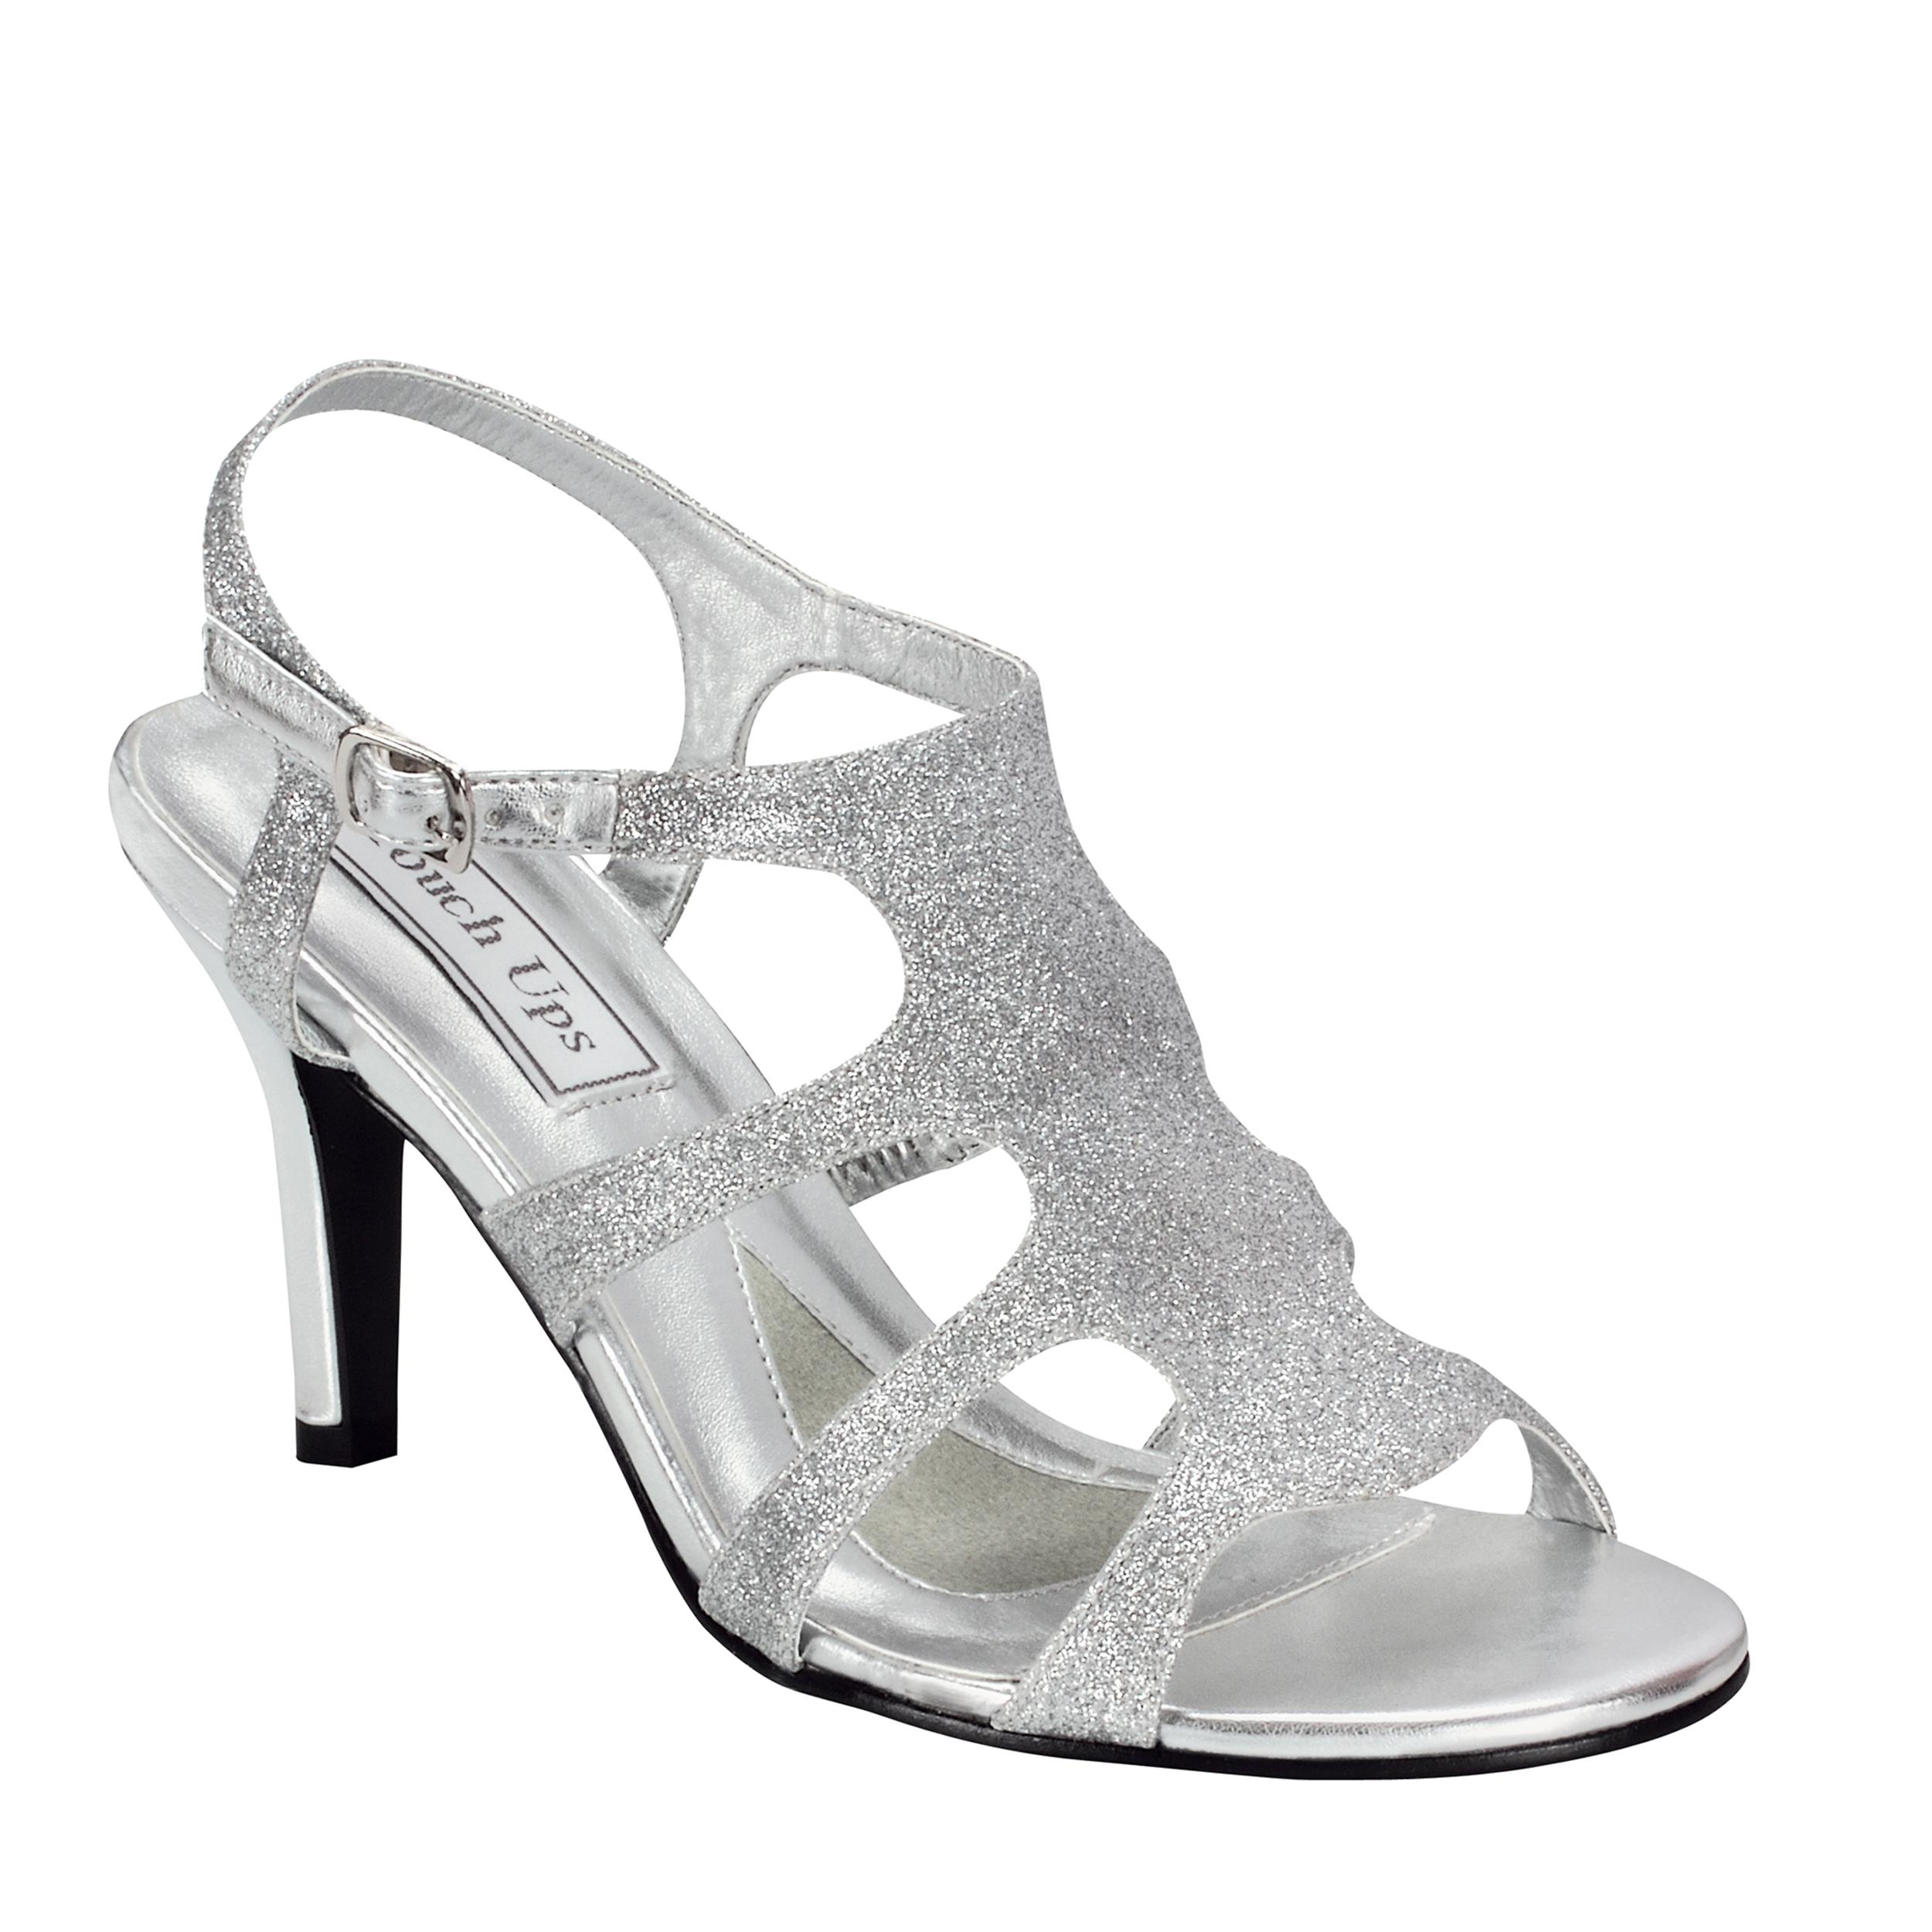 Touch Ups Womens Aphrodite Sandal,Silver,8.5 M US